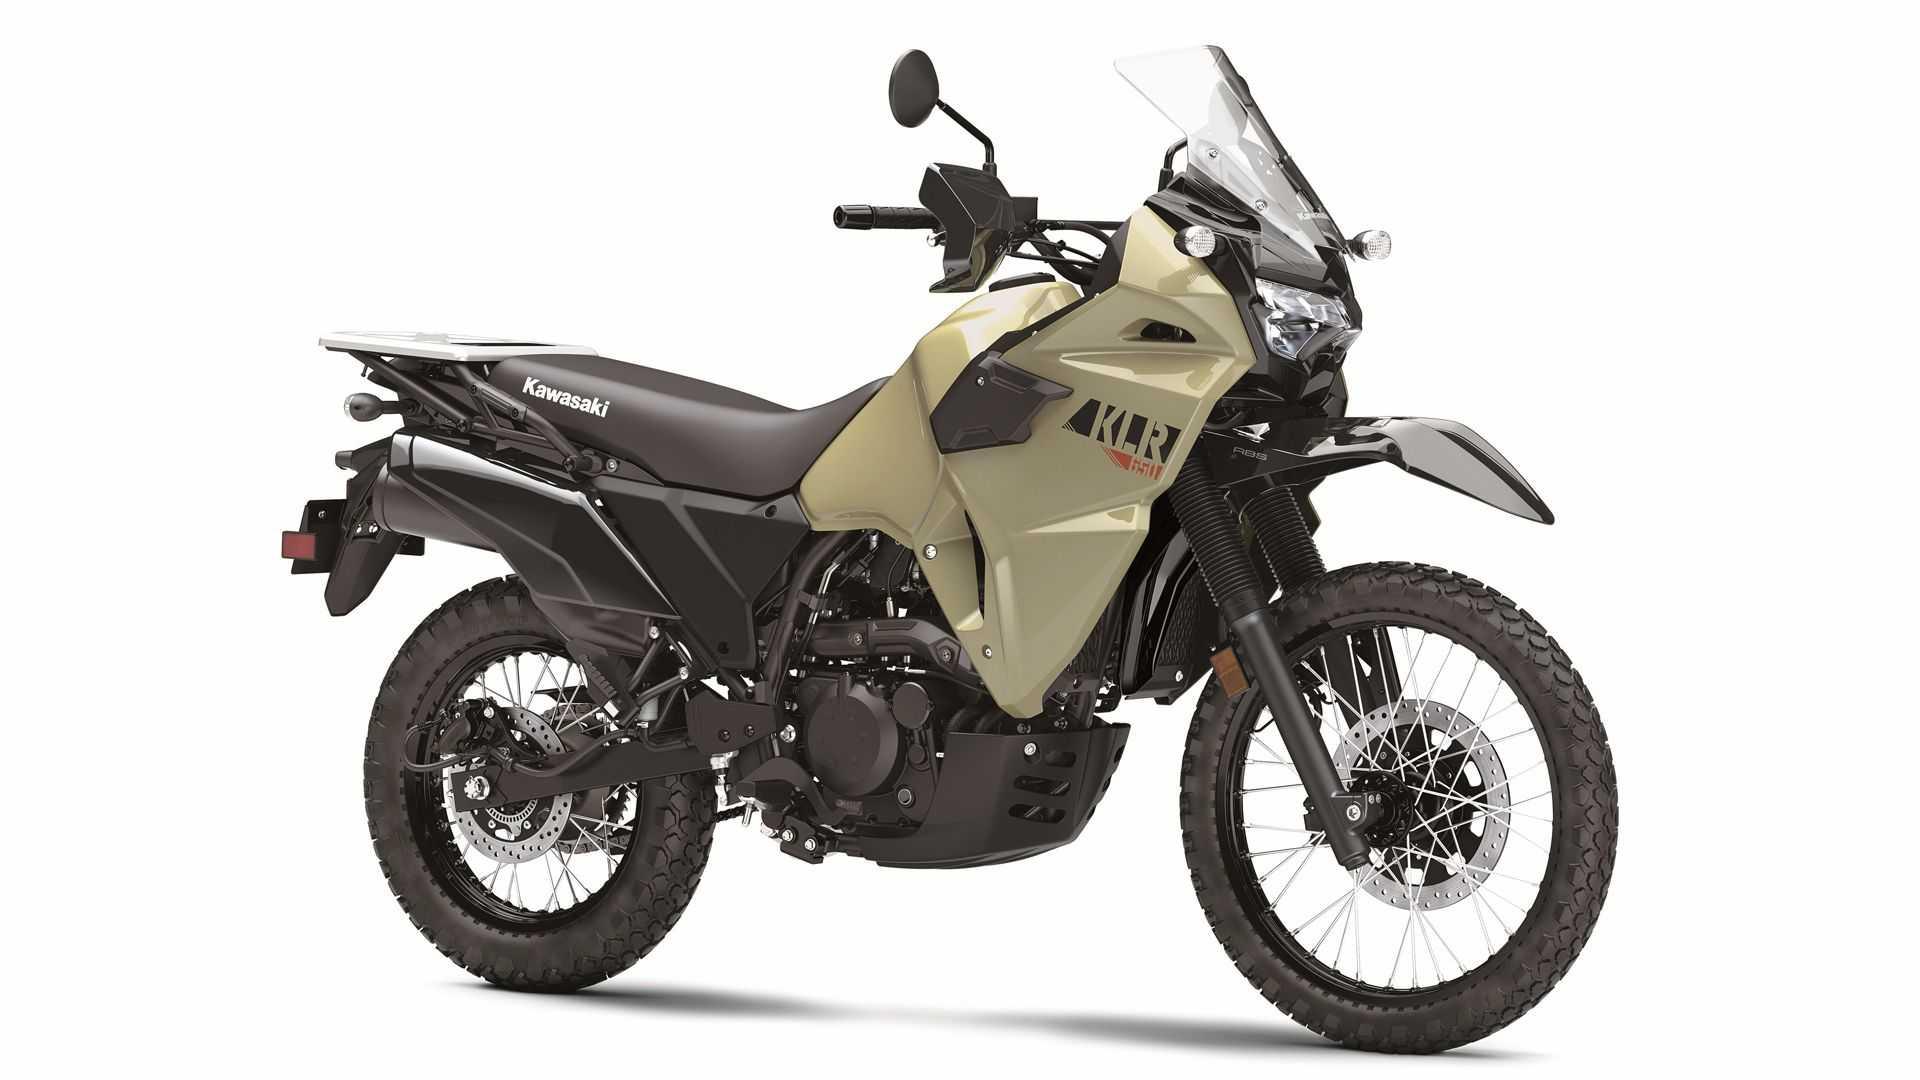 Kawasaki KLR650 вернулся — но, к сожалению, не для нас!